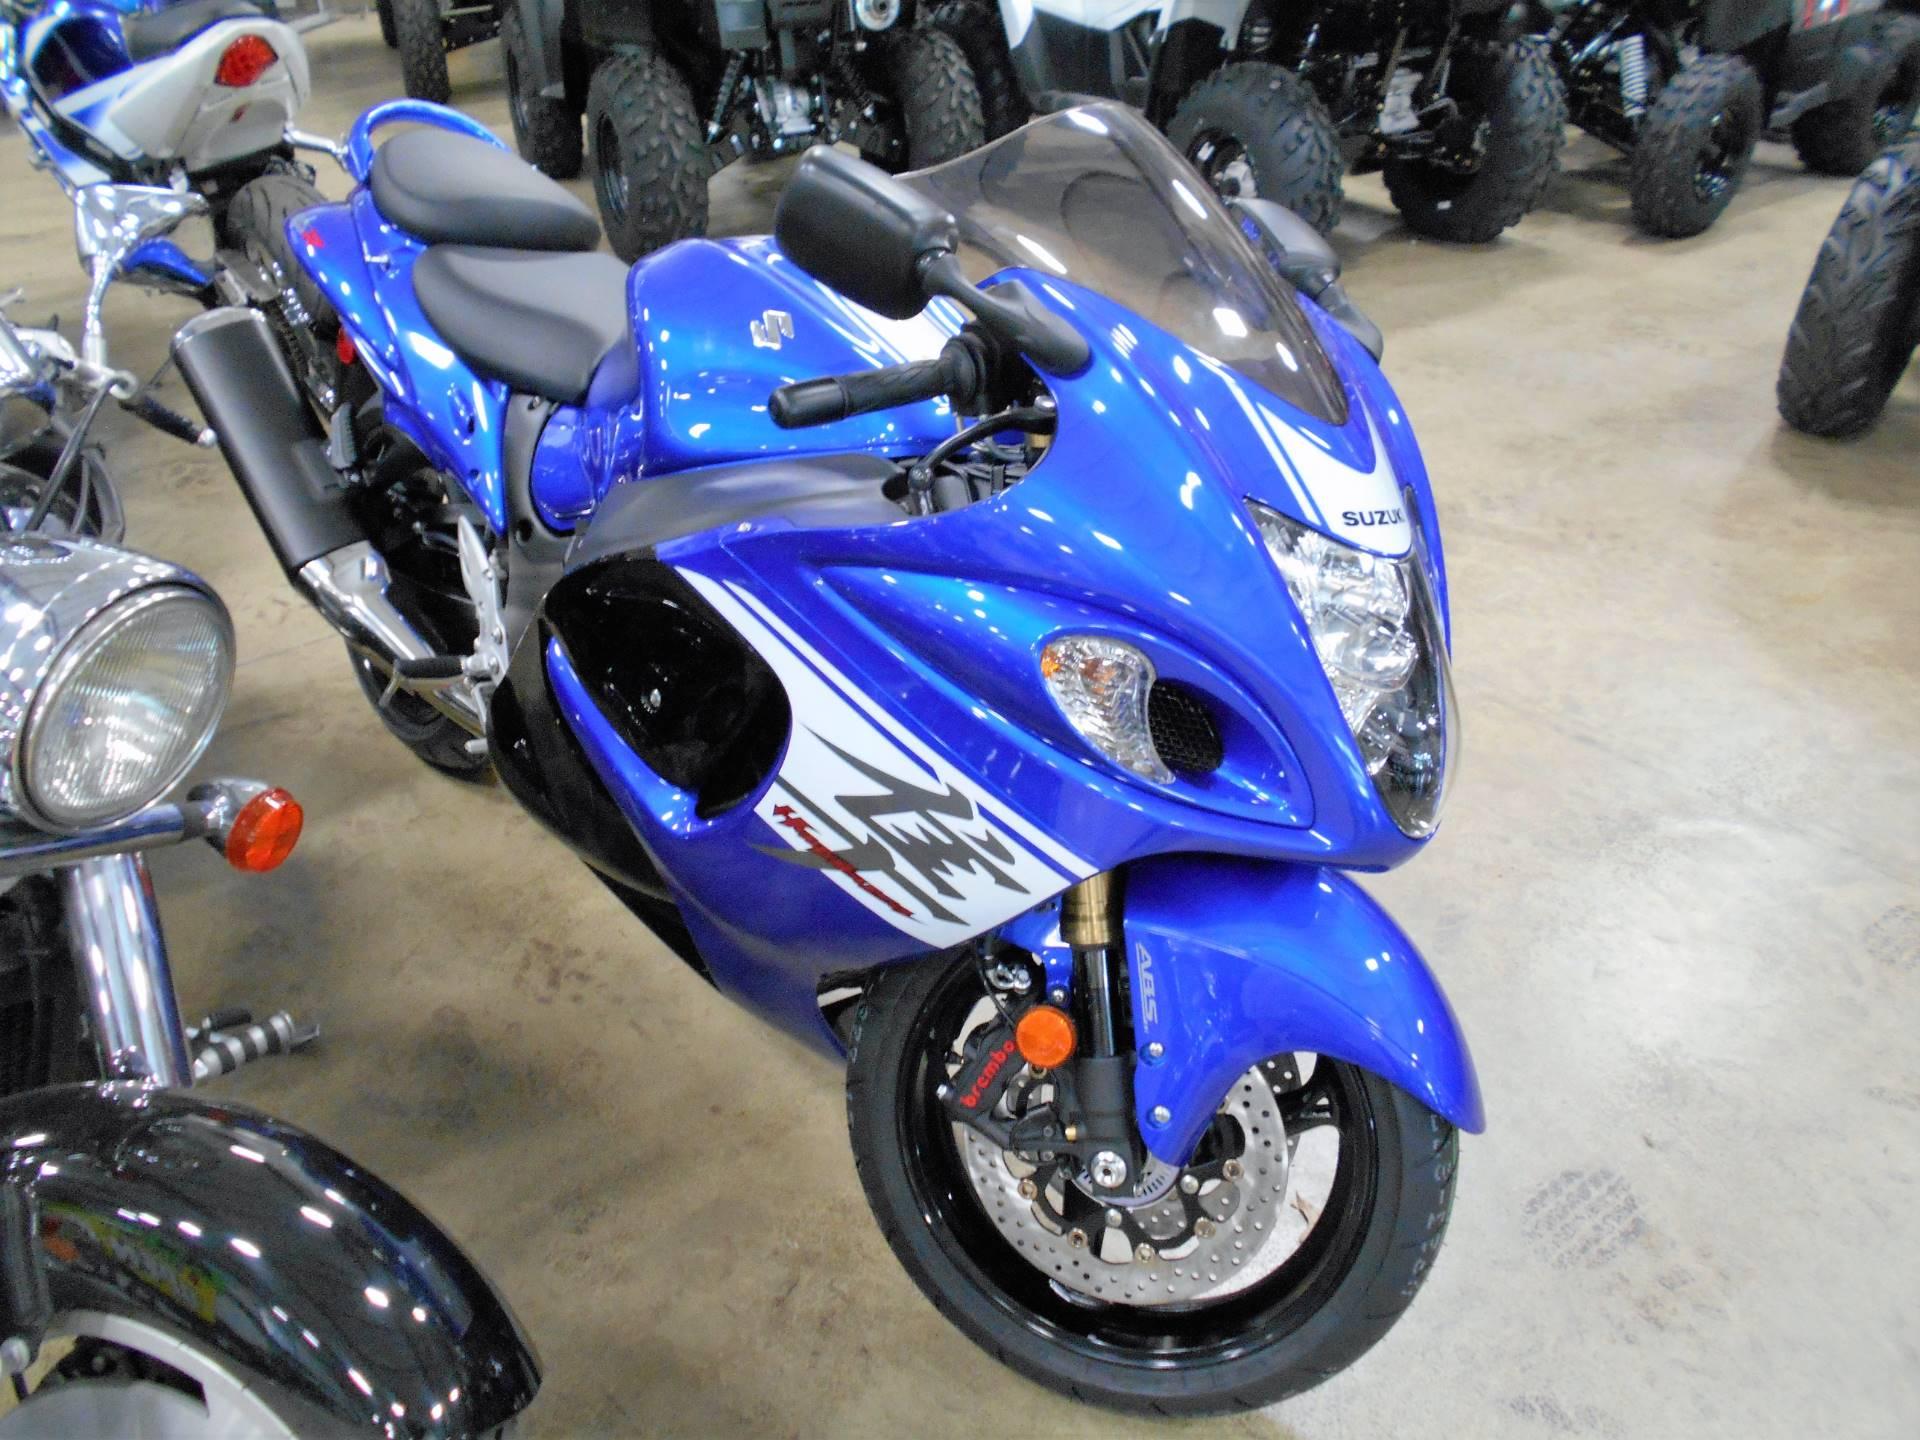 New 2017 Suzuki Hayabusa Motorcycles in Belvidere, IL